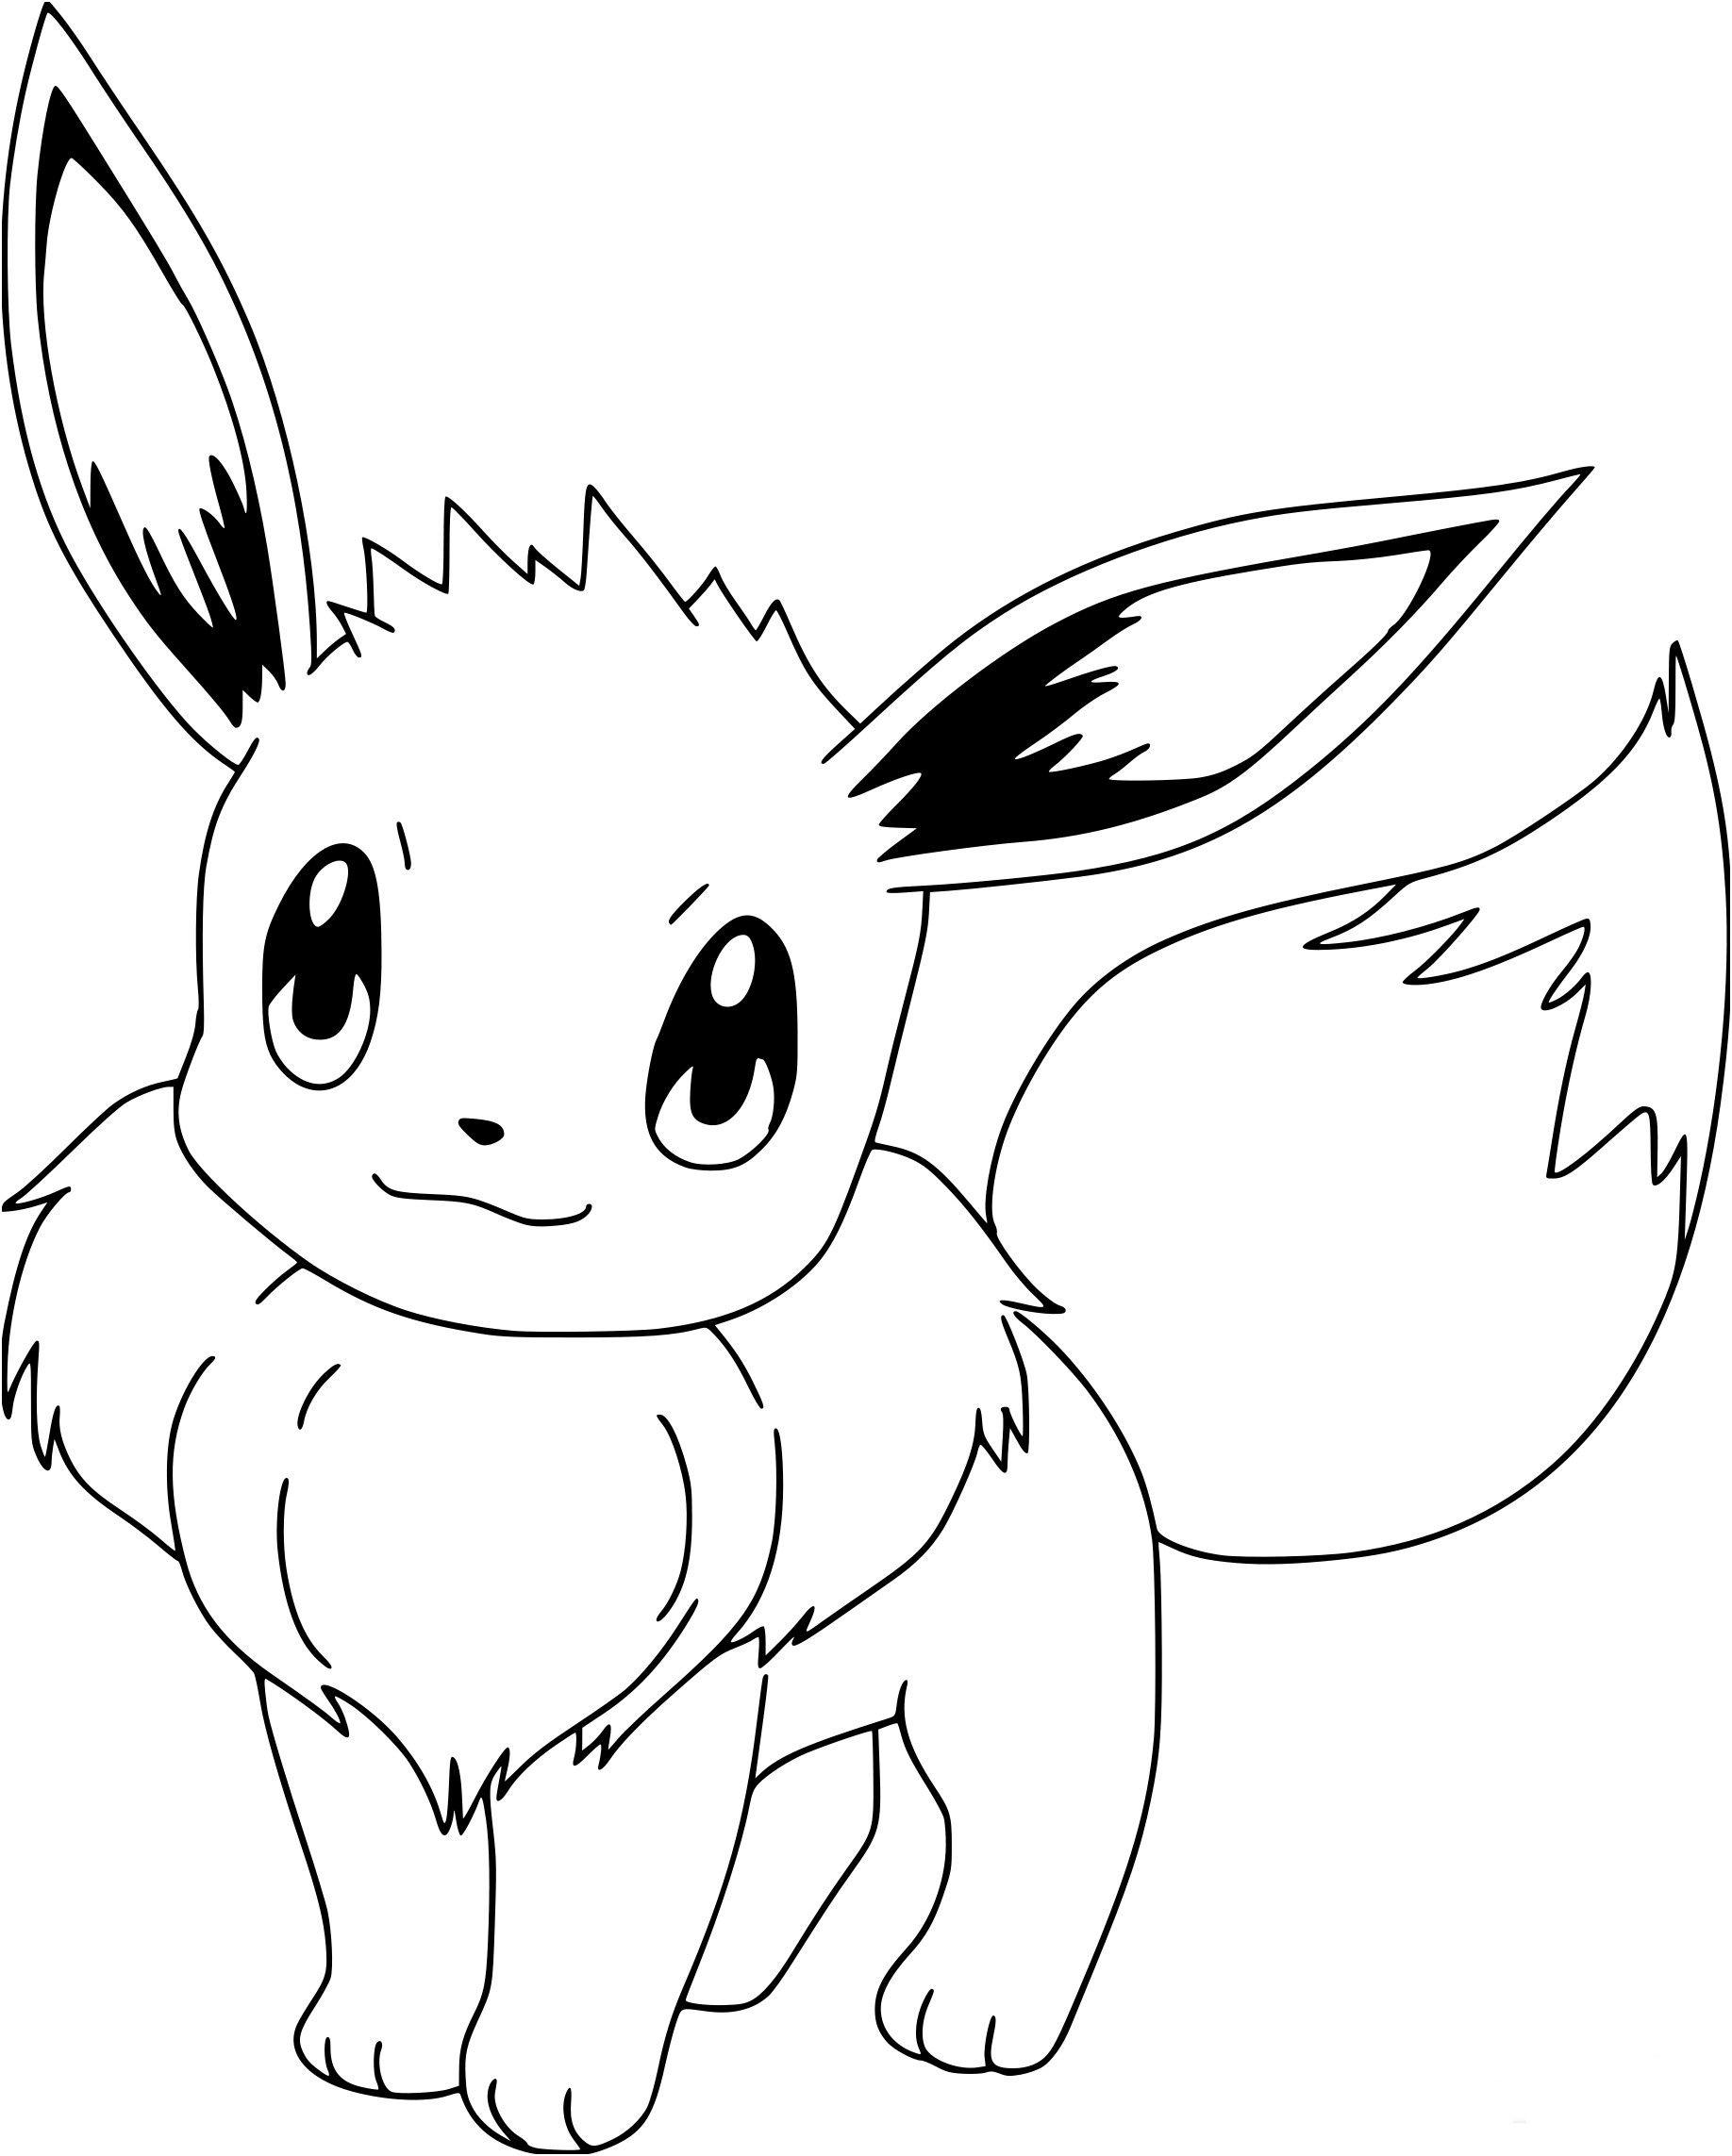 12 Bon Coloriage Pokemon Go Stock Coloriage Pokemon Dessin Pokemon Dessin Pokemon A Imprimer